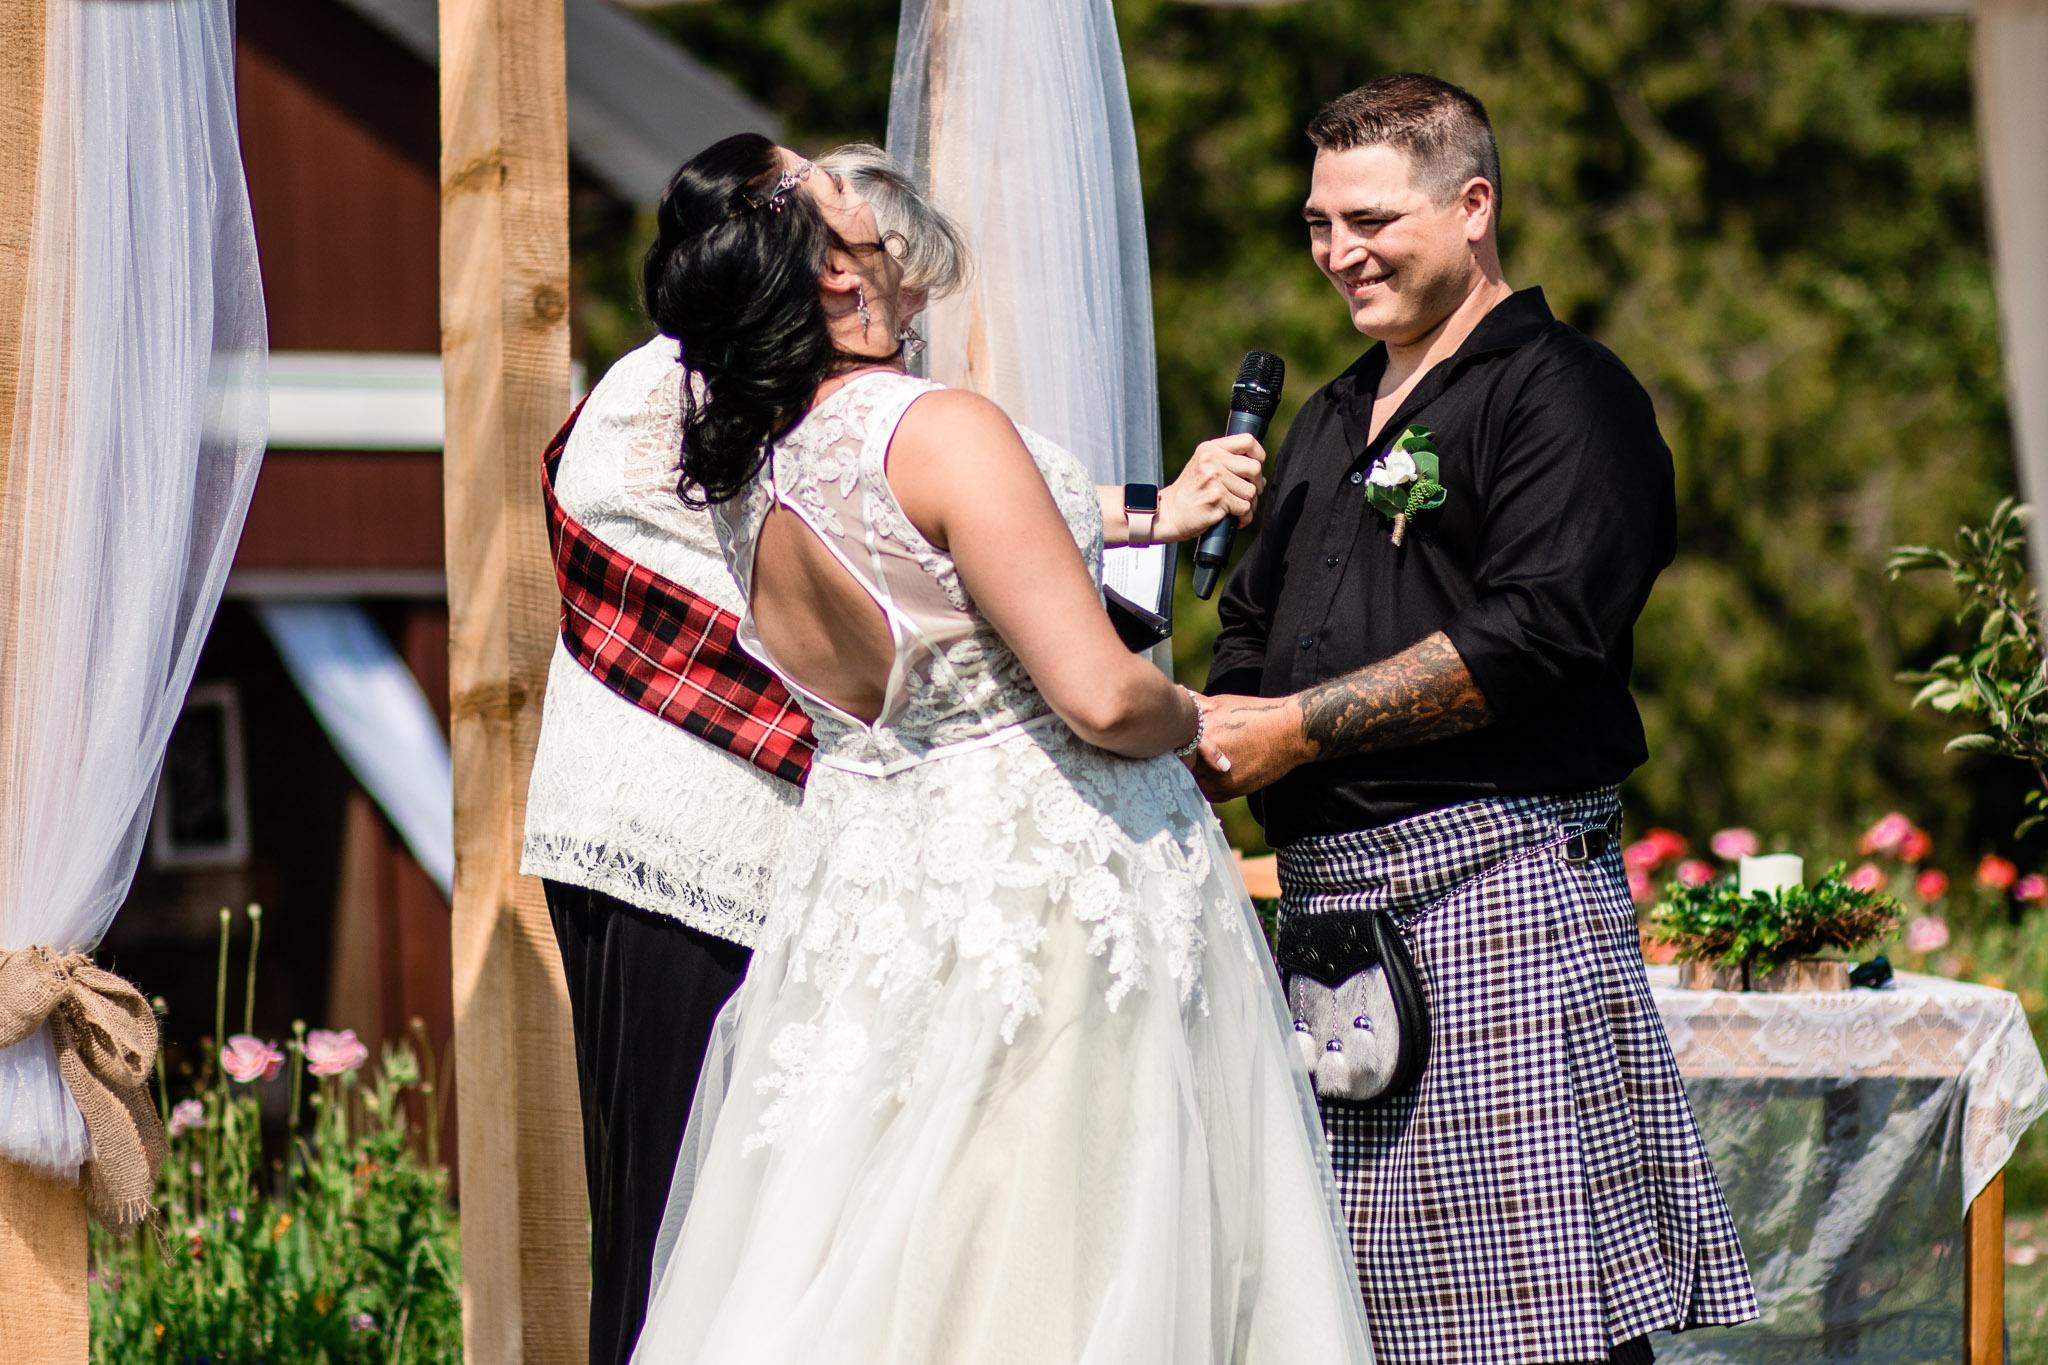 White-Owl-Barn-Langley-Wedding-Photographer-Rustic-Scottish-Country-Food-Truck-Documentary-Open-Bar-Wedding-241.jpg